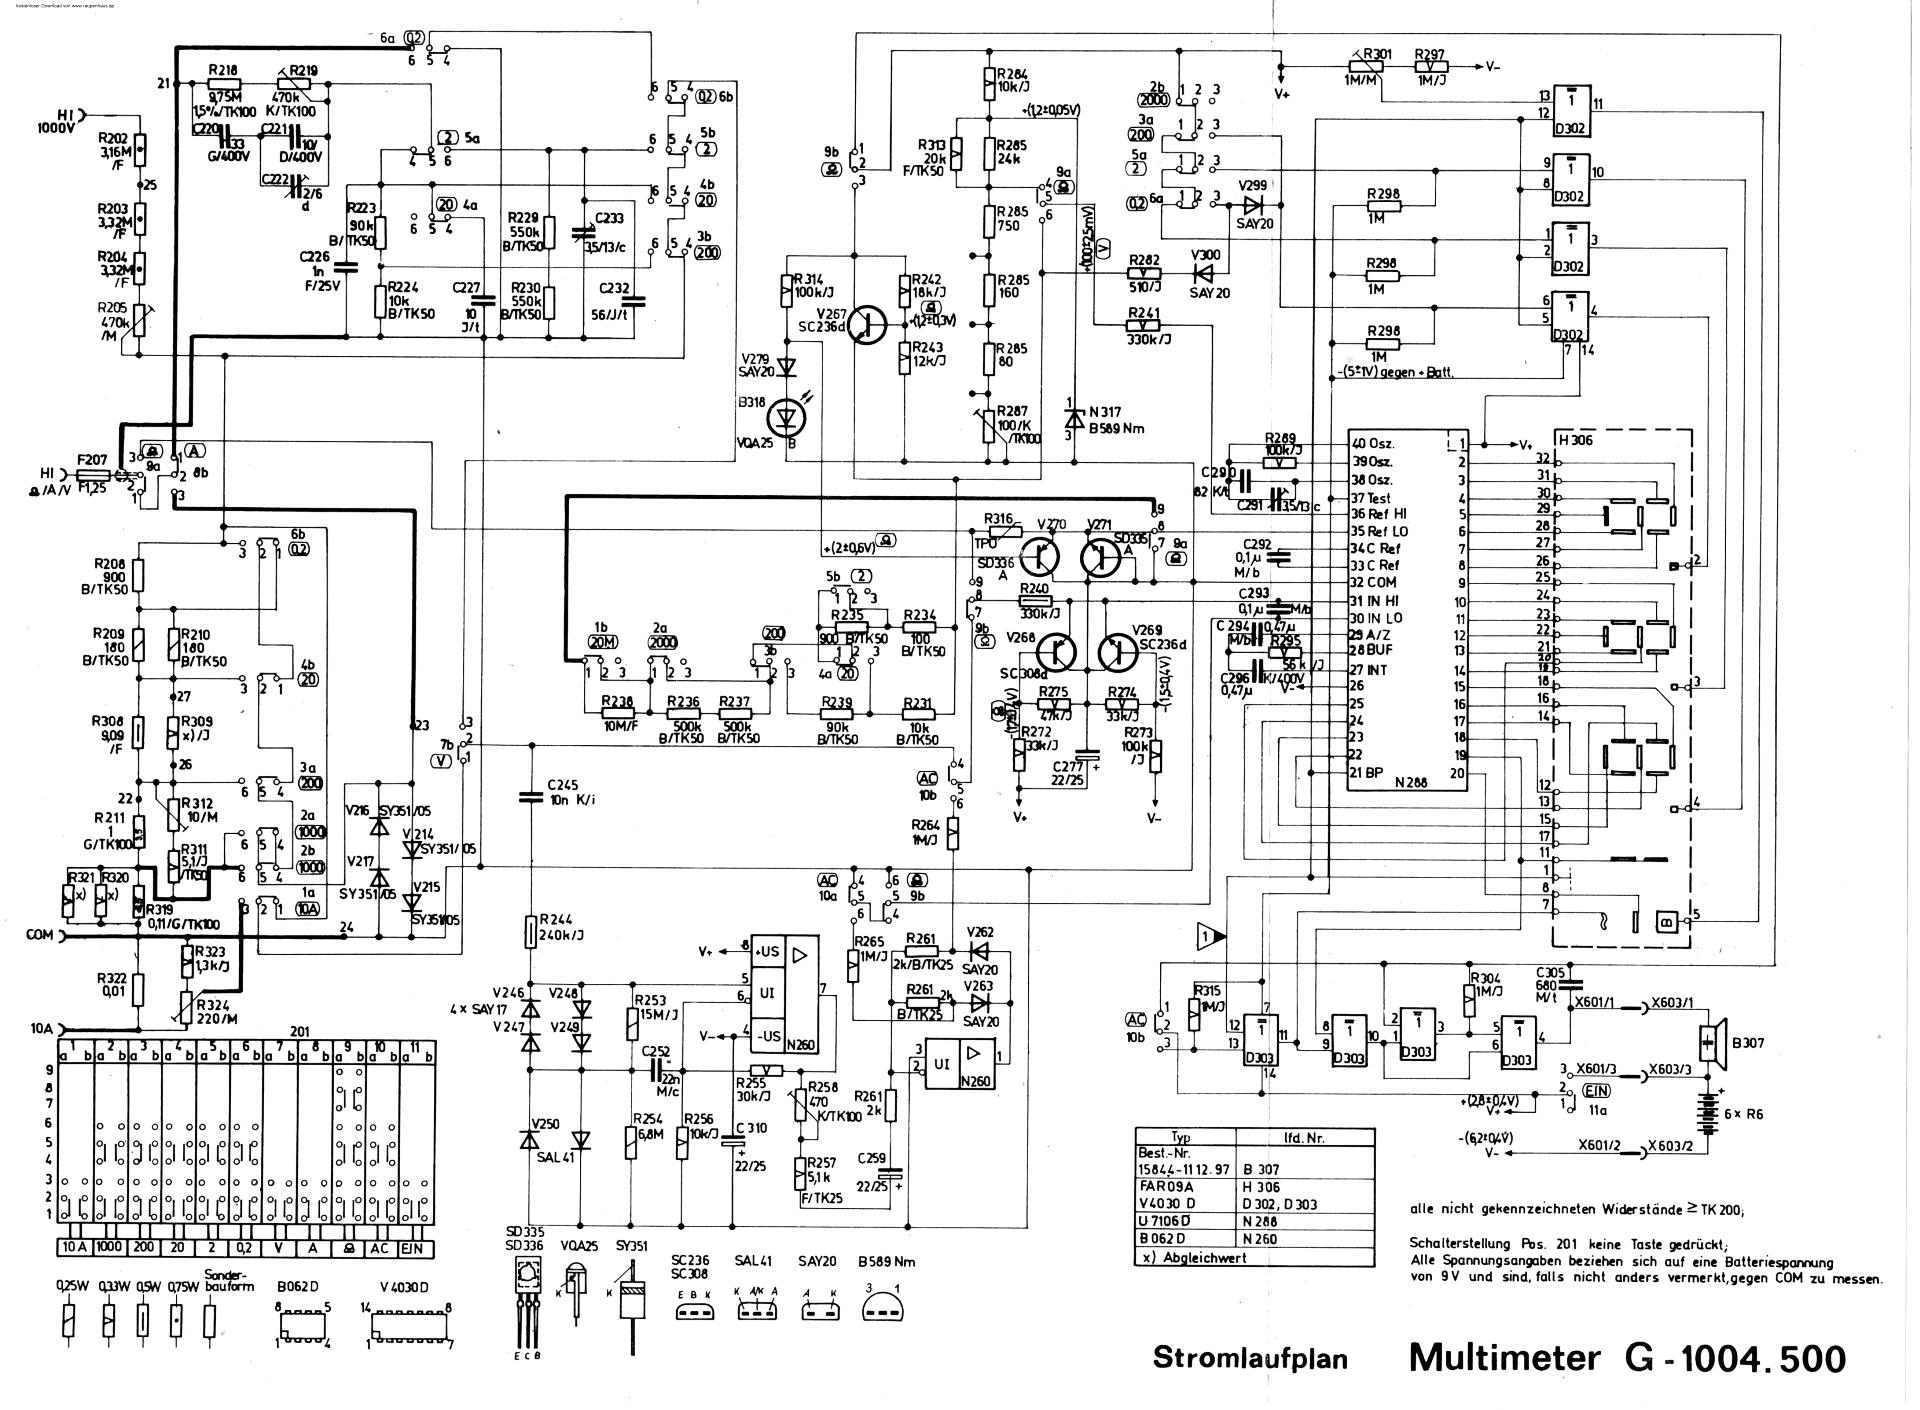 Schaltung DMM 1004.500 - ?? - Robotrontechnik-Forum